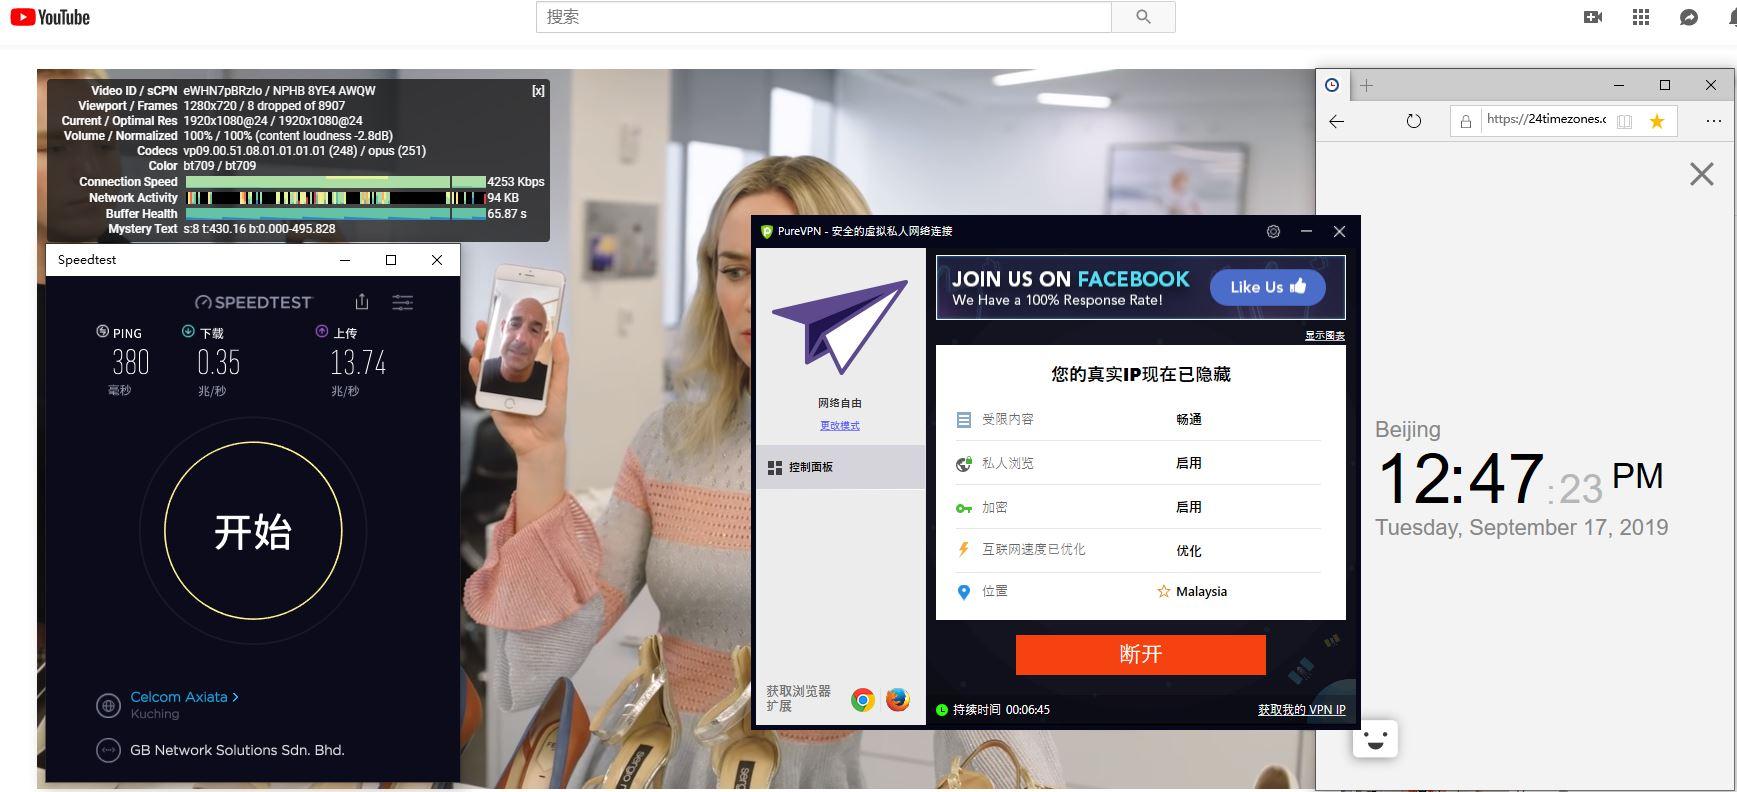 PureVPN windows Malaysia 中国VPN翻墙 科学上网 YouTube连接速度测试-2-20190917